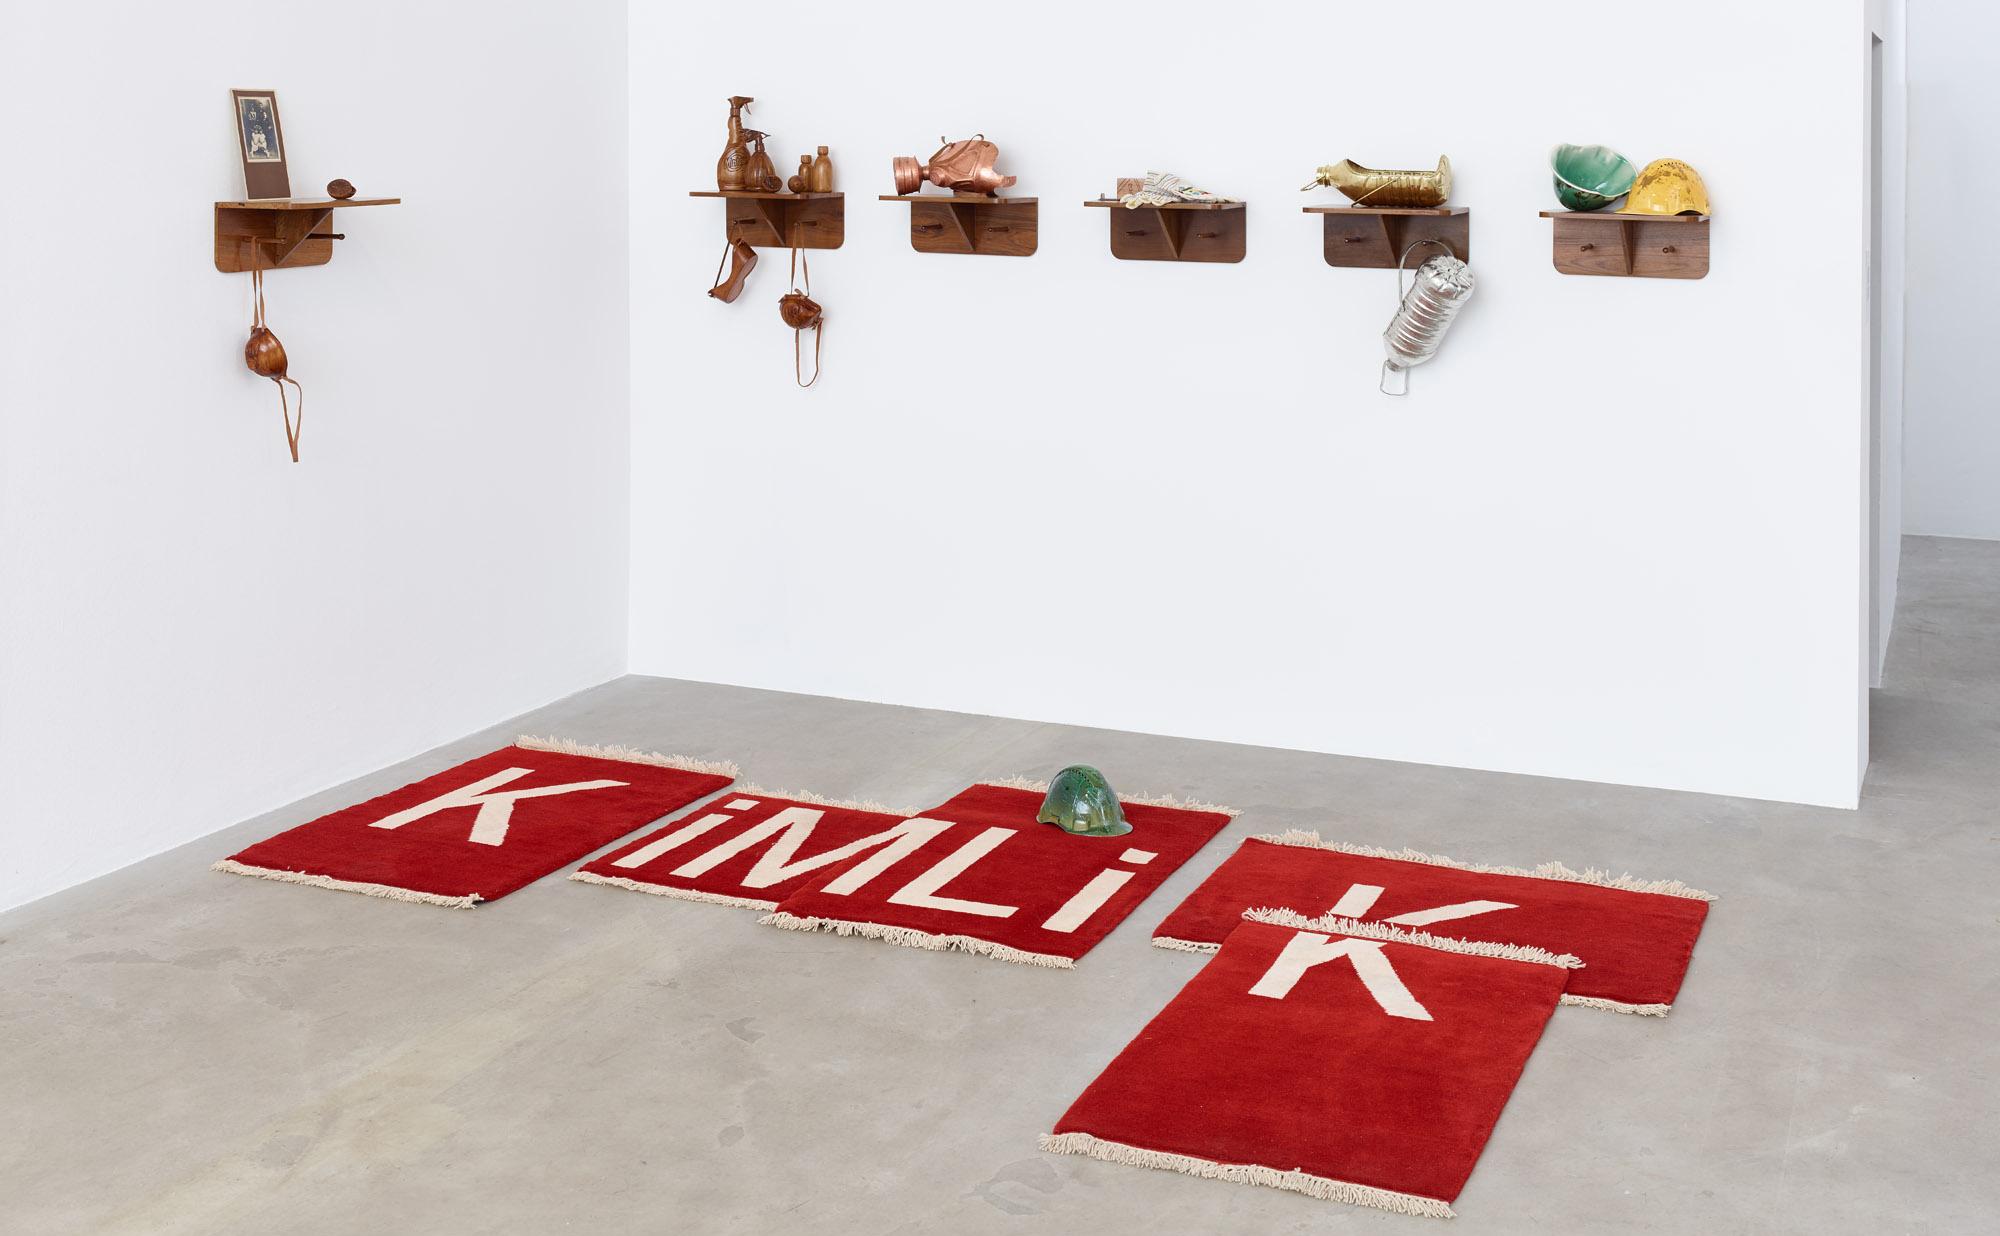 'Kimlik' or 'Identity' by Viron Erol Vert, circa 2016. Composition of five woollen rugs. | Image courtesy of Viron Erol Vert.